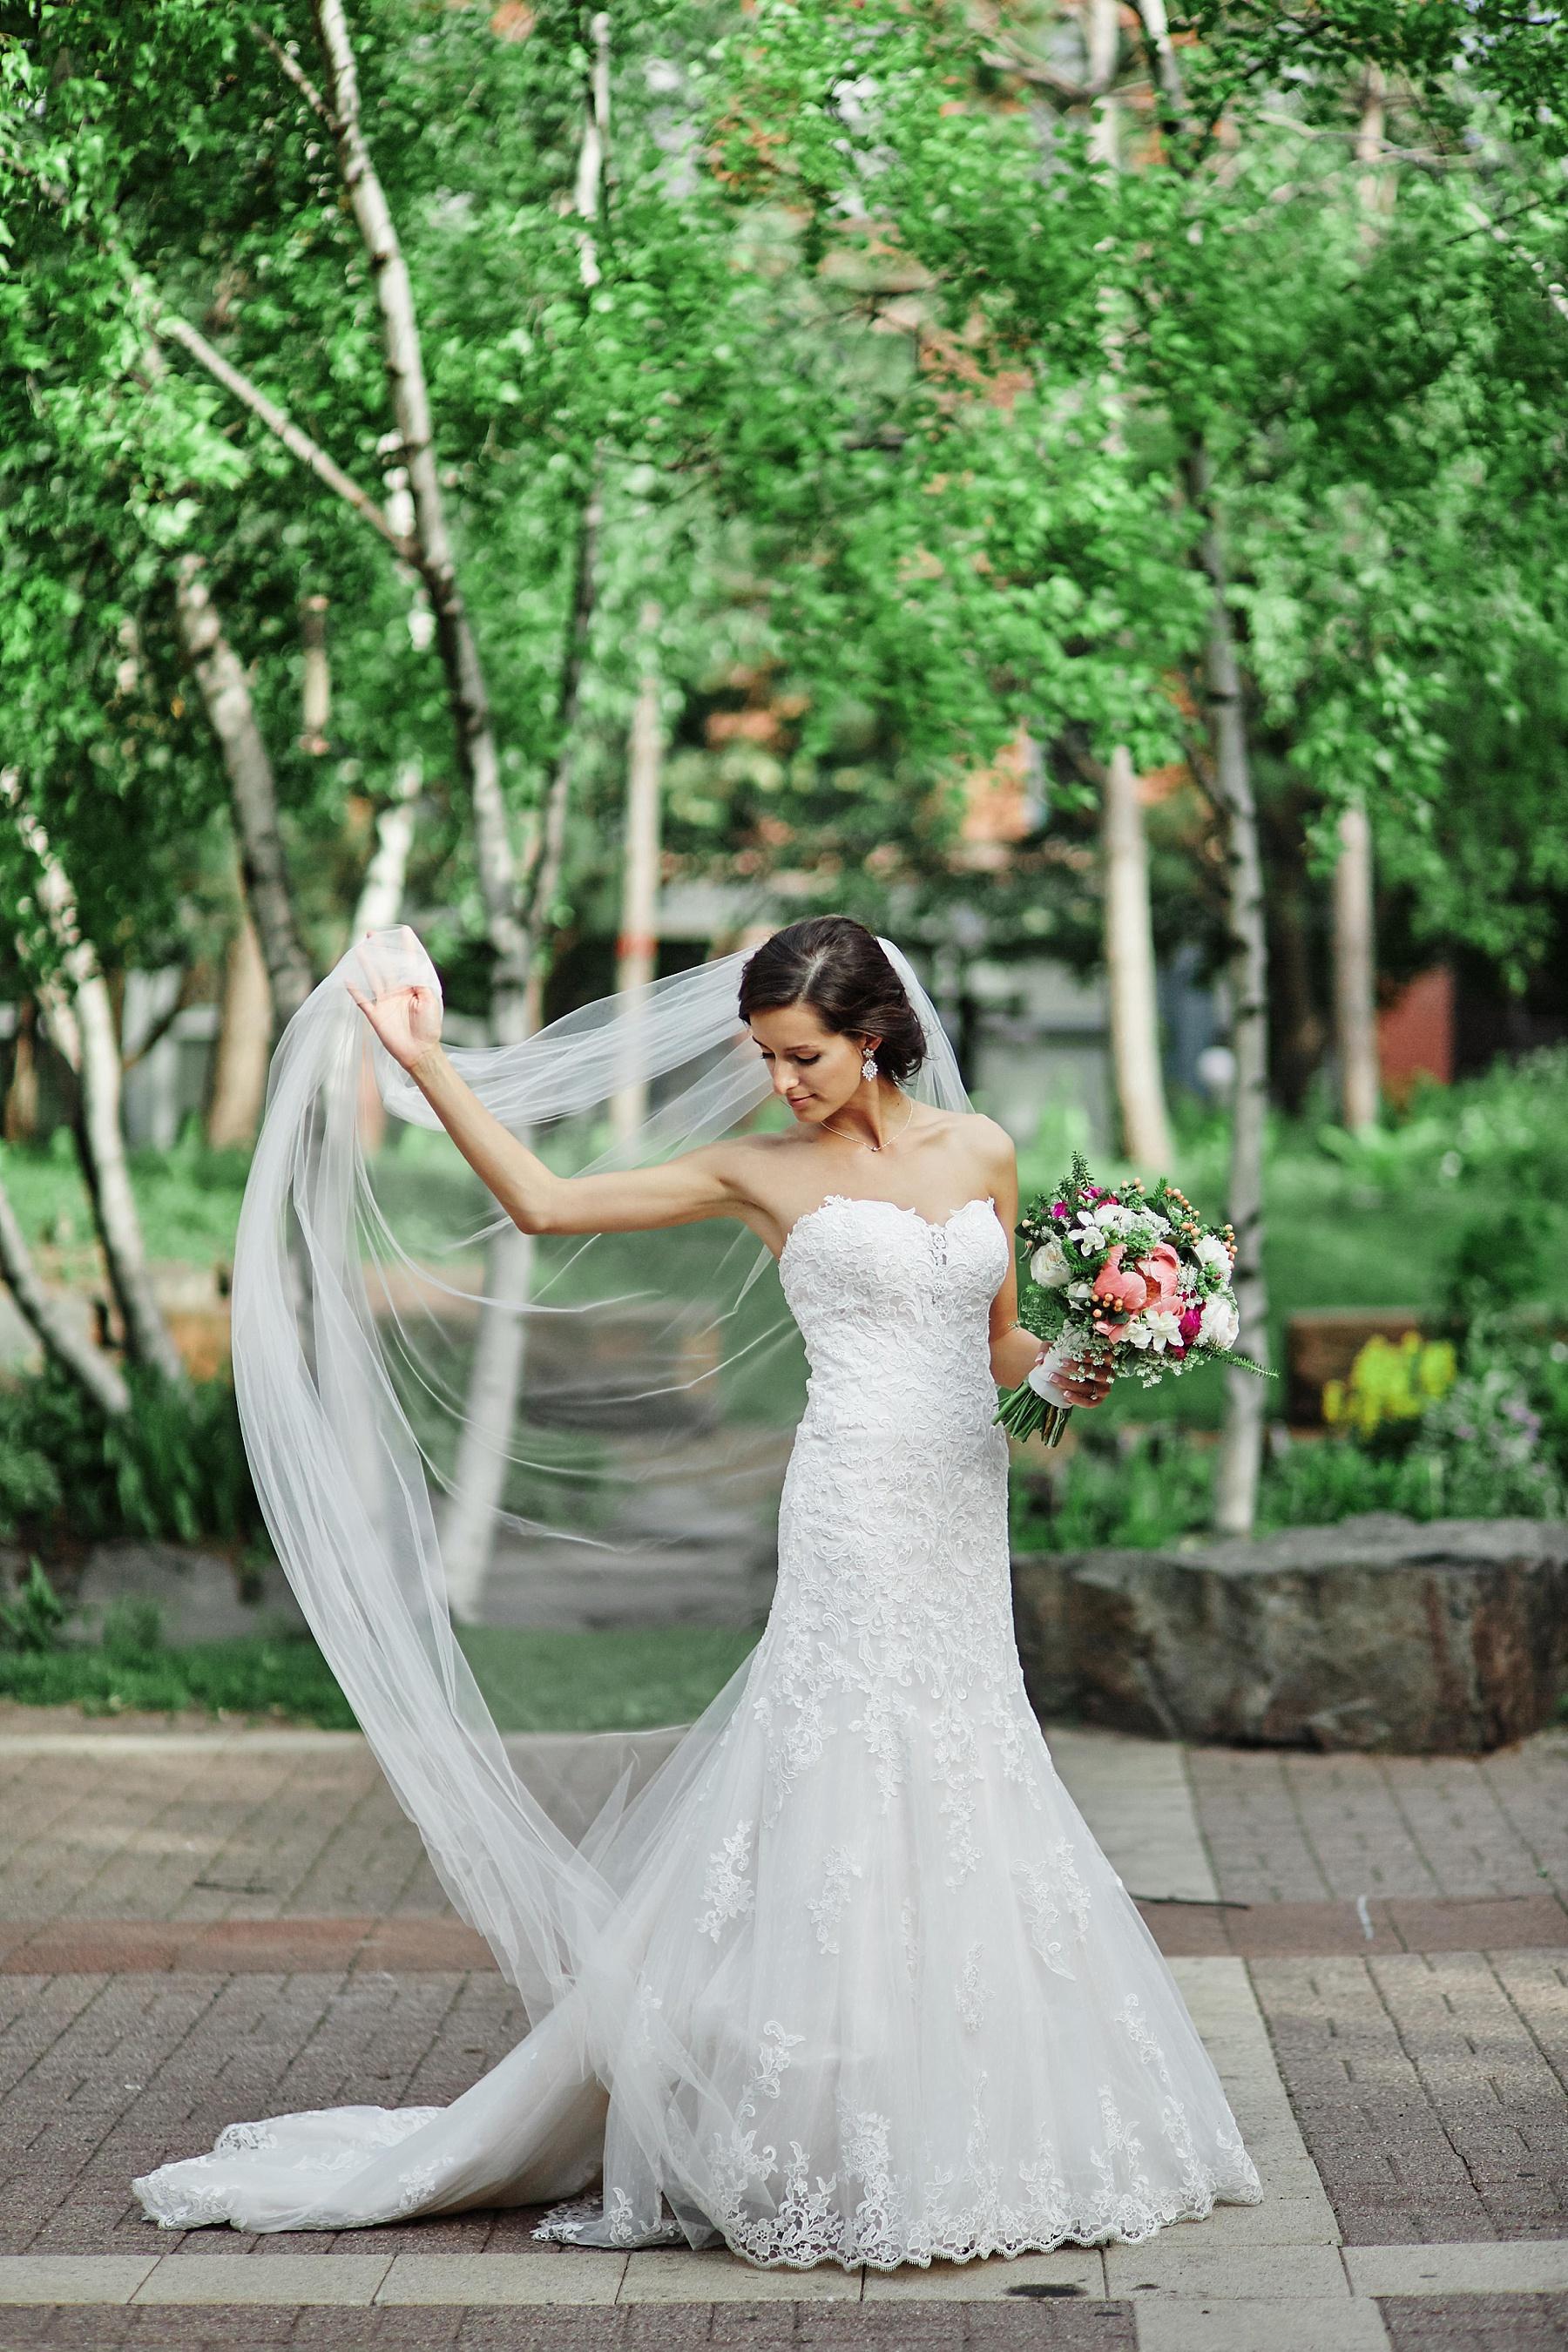 ABULAE-Wedding-Saint-paul-MN-Josh-Sofia-Wedding-Mears-Park_0794.jpg